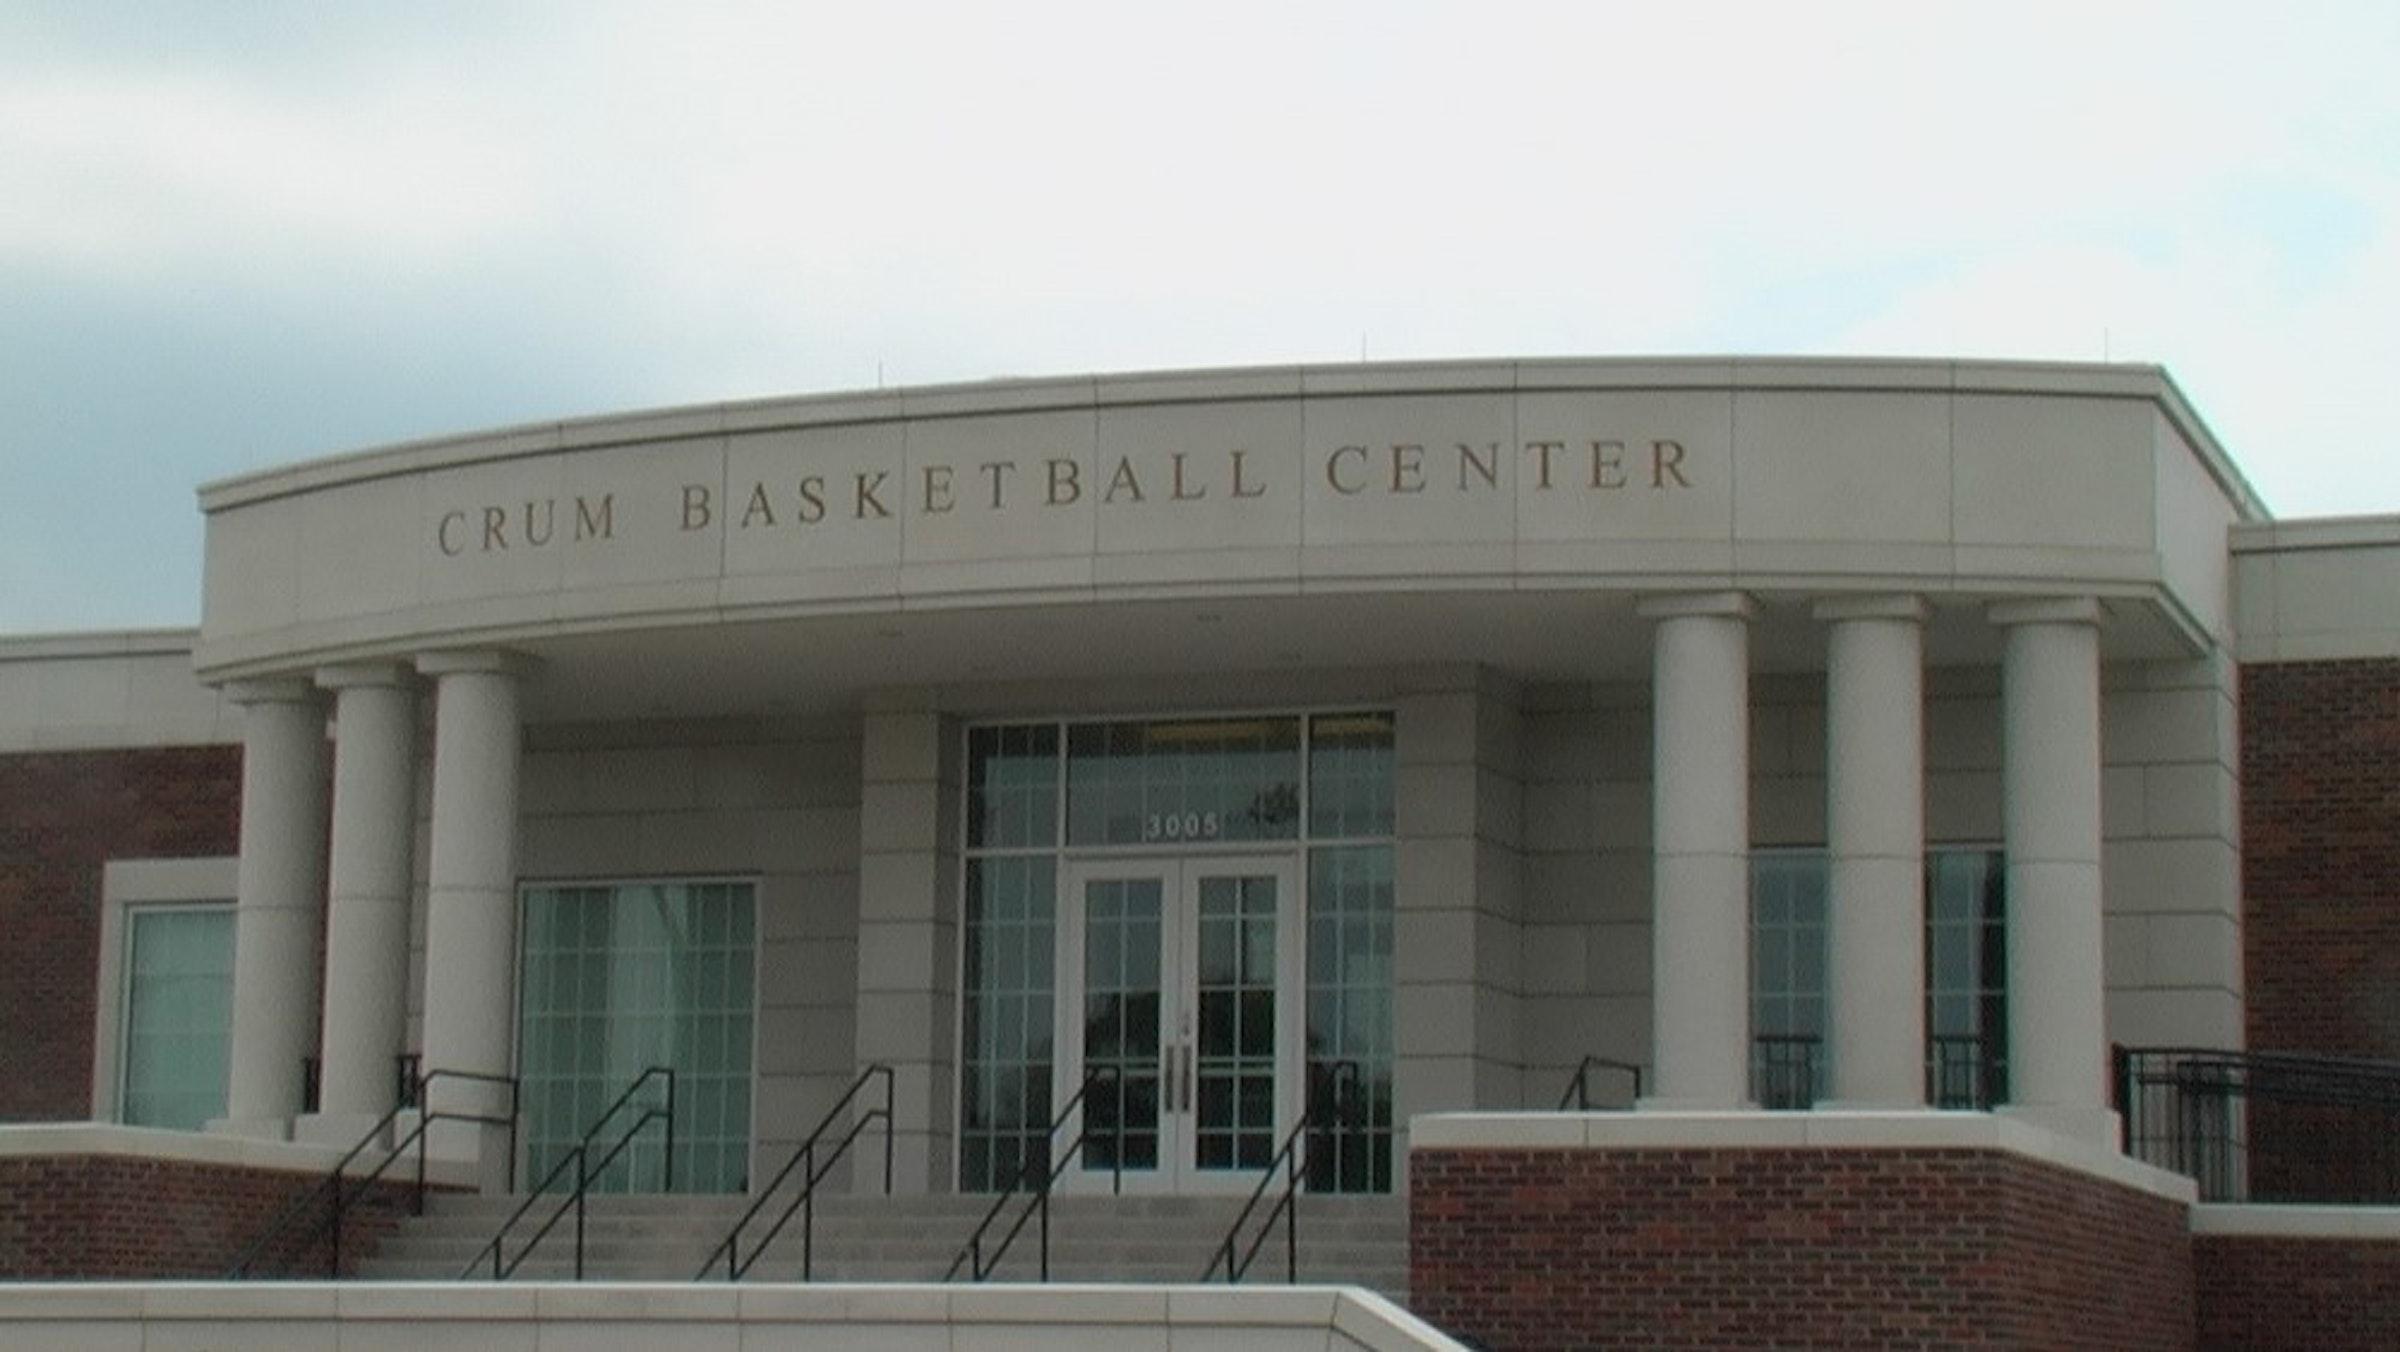 SMU - Crum Basketball Center in Beyond Dallas